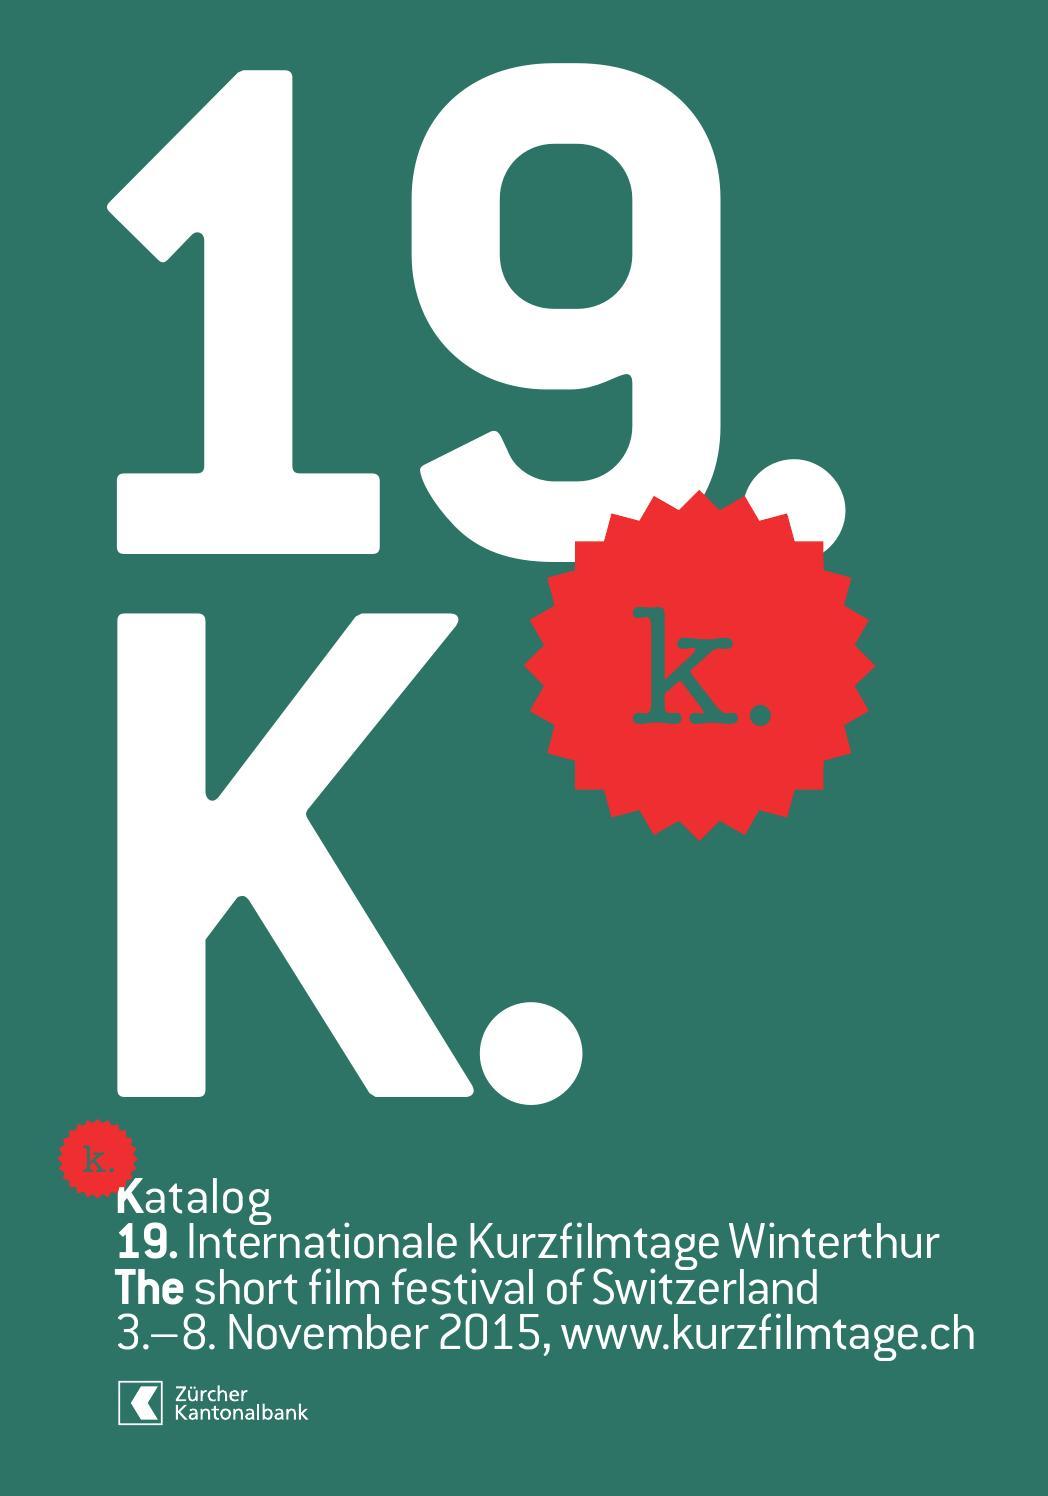 Katalog 19 Internationale Kurzfilmtage Winterthur By Int